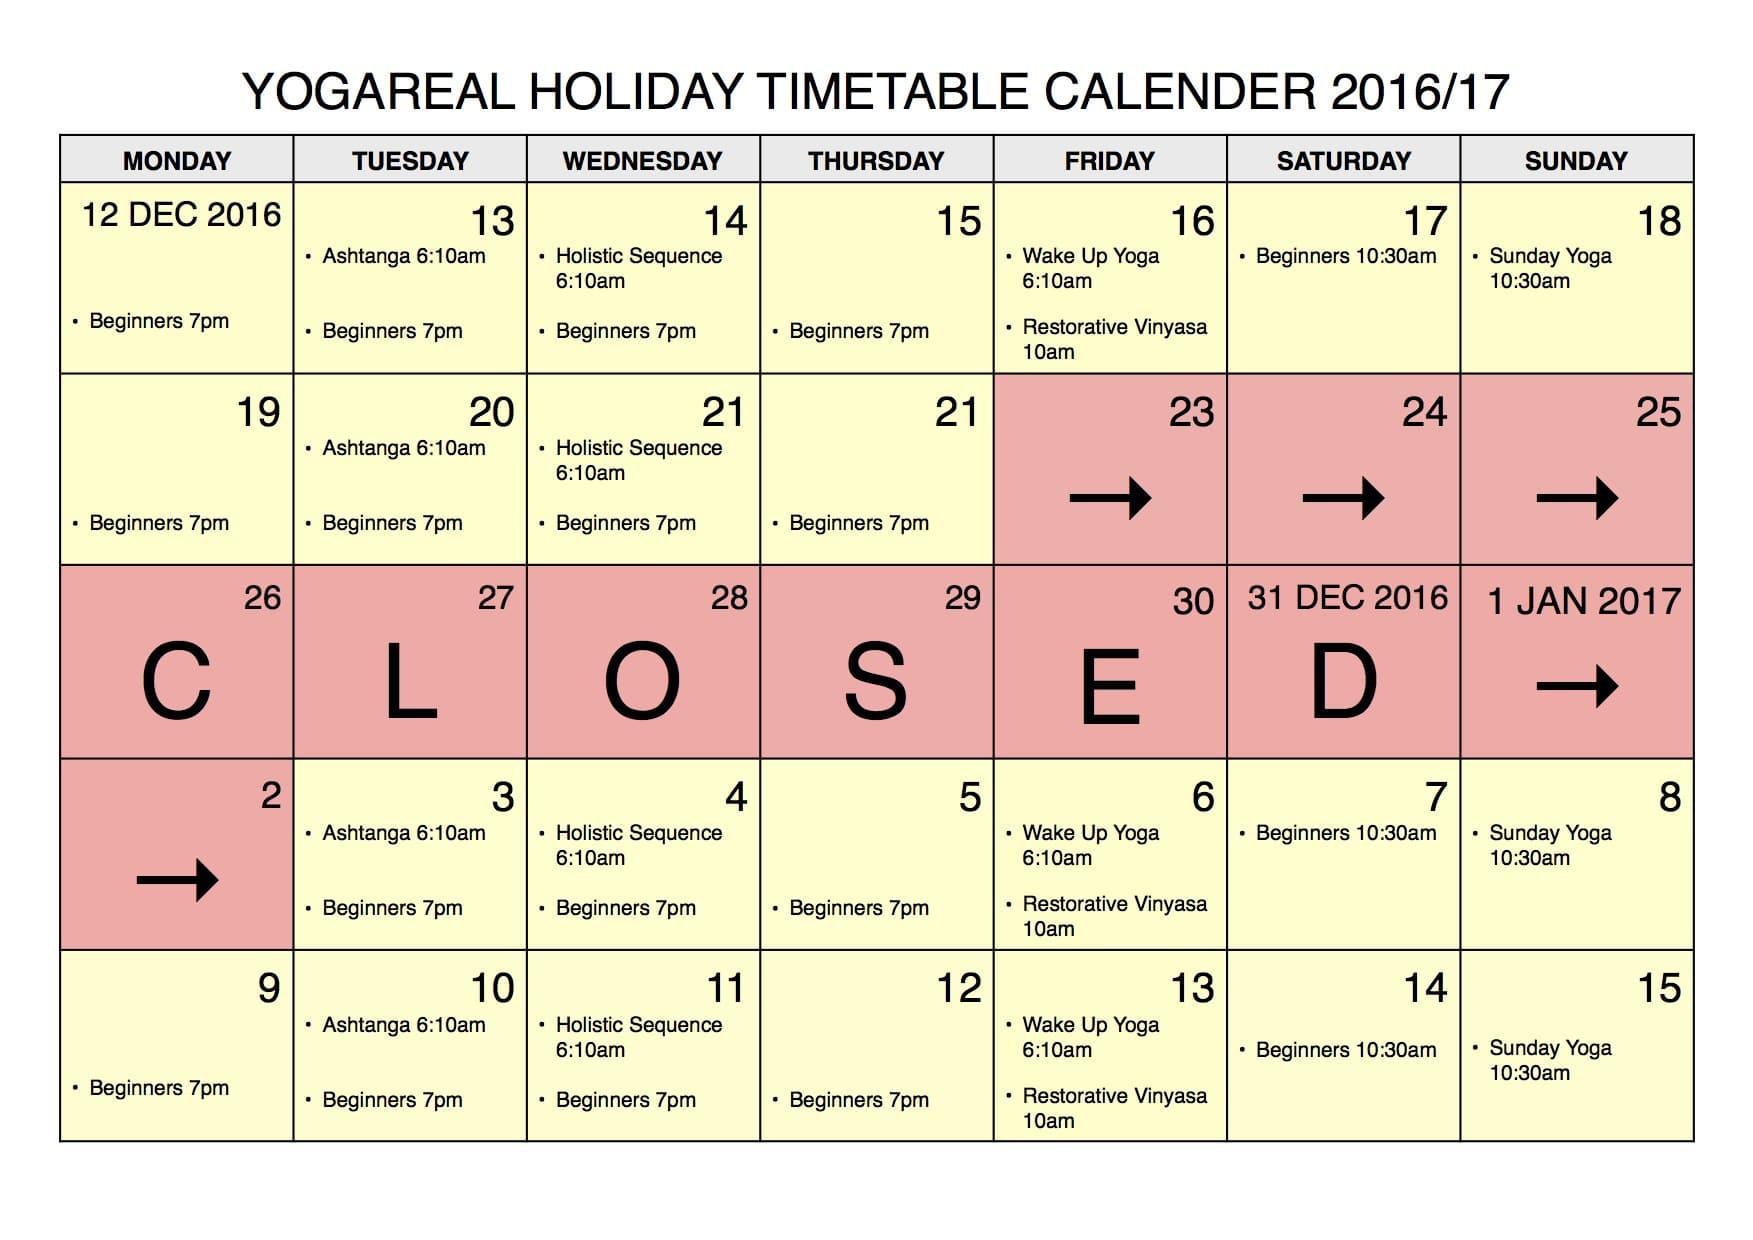 Yogareal-Holiday-Calender-20162017-copy.jpg